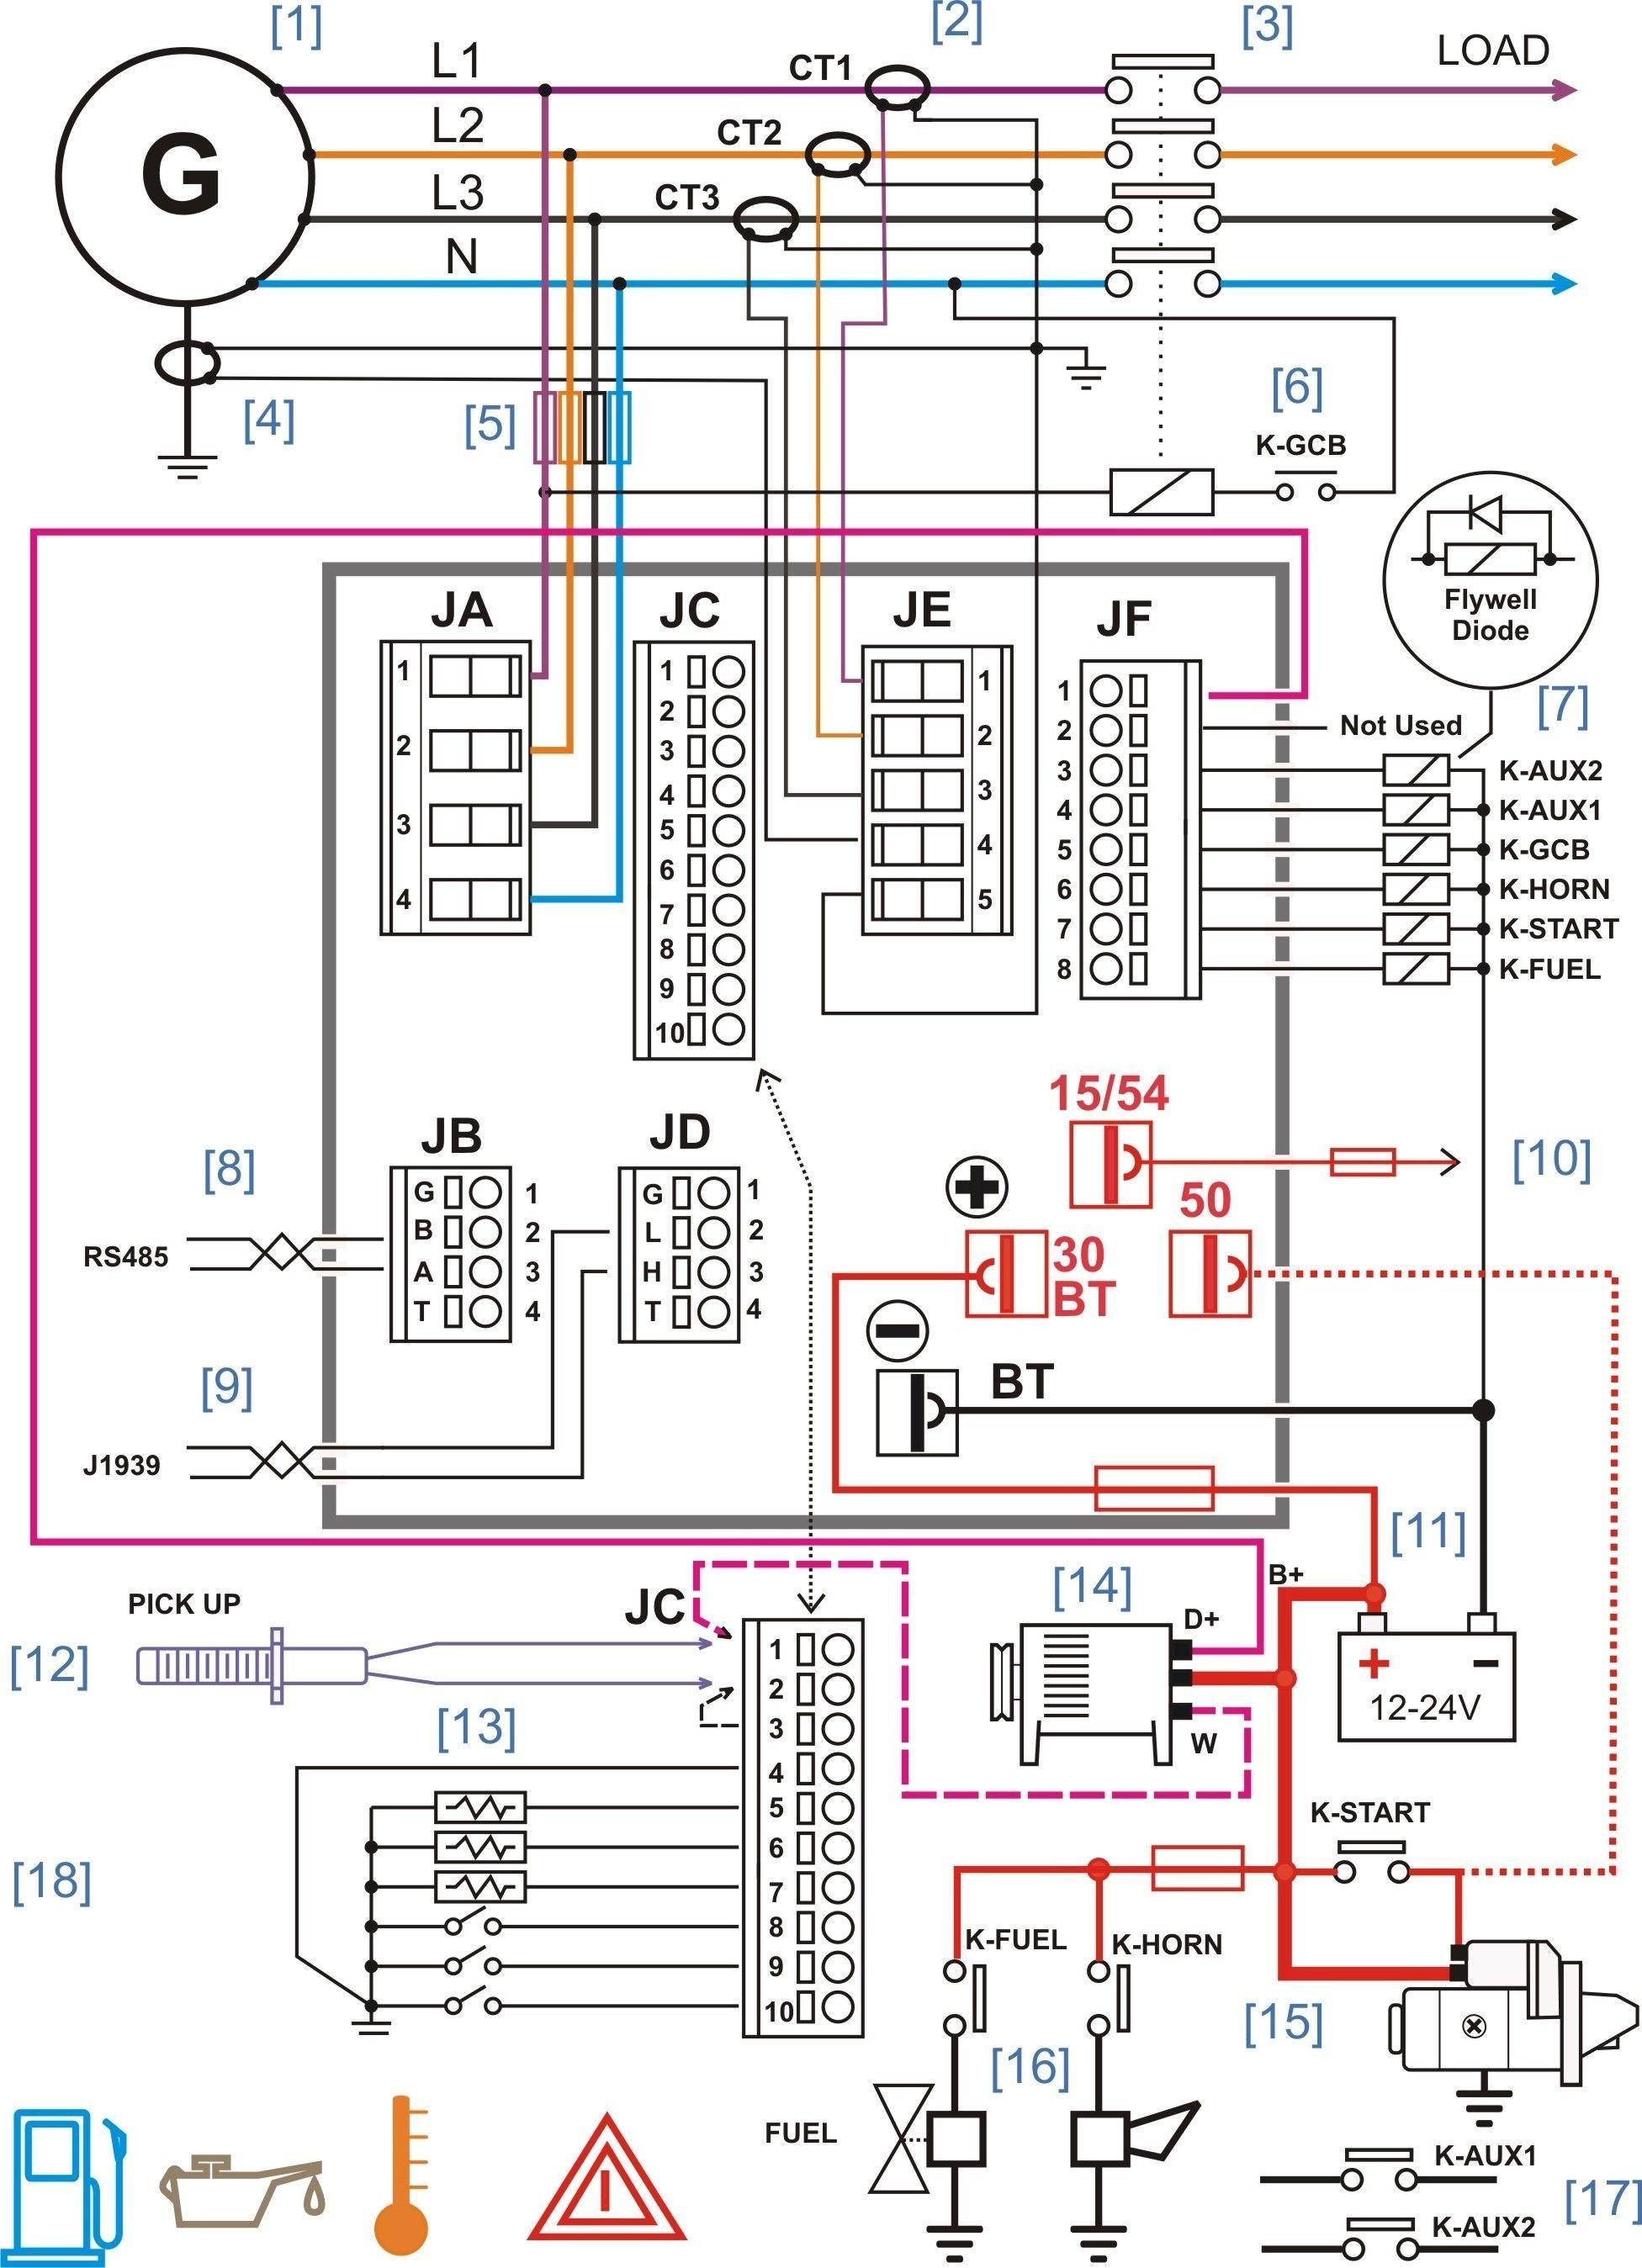 Ats Wiring Diagram for Standby Generator | Free Wiring Diagram